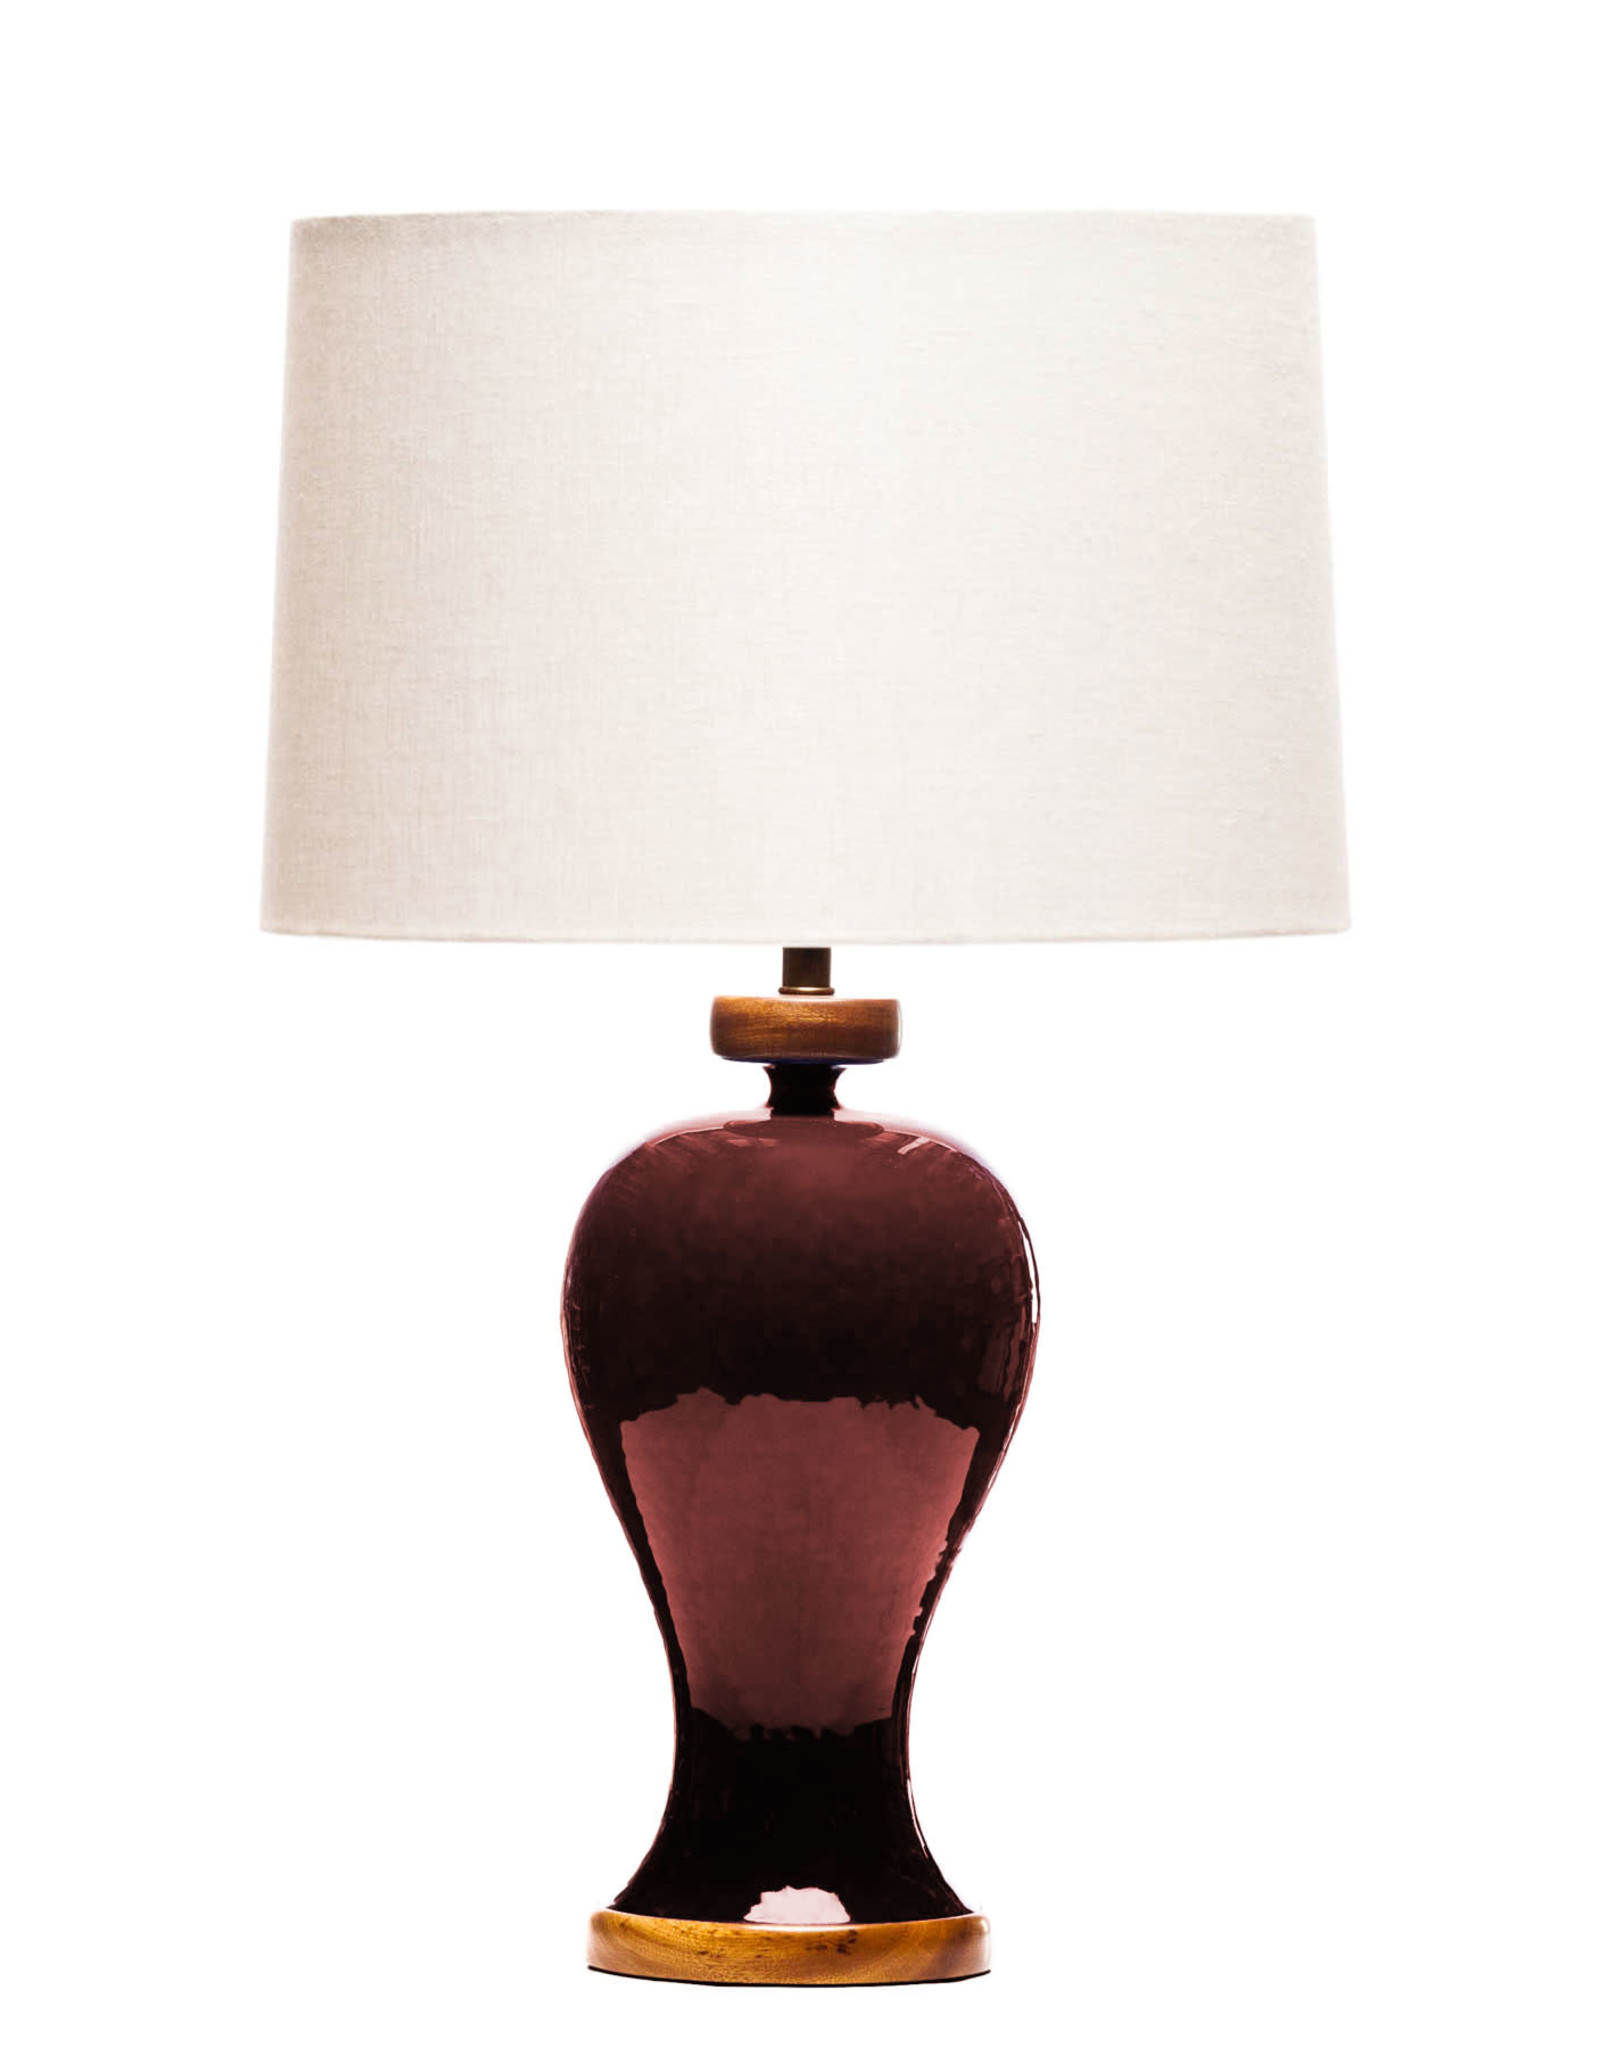 Lawrence & Scott Anita Porcelain Table Lamp (Pinot Red)